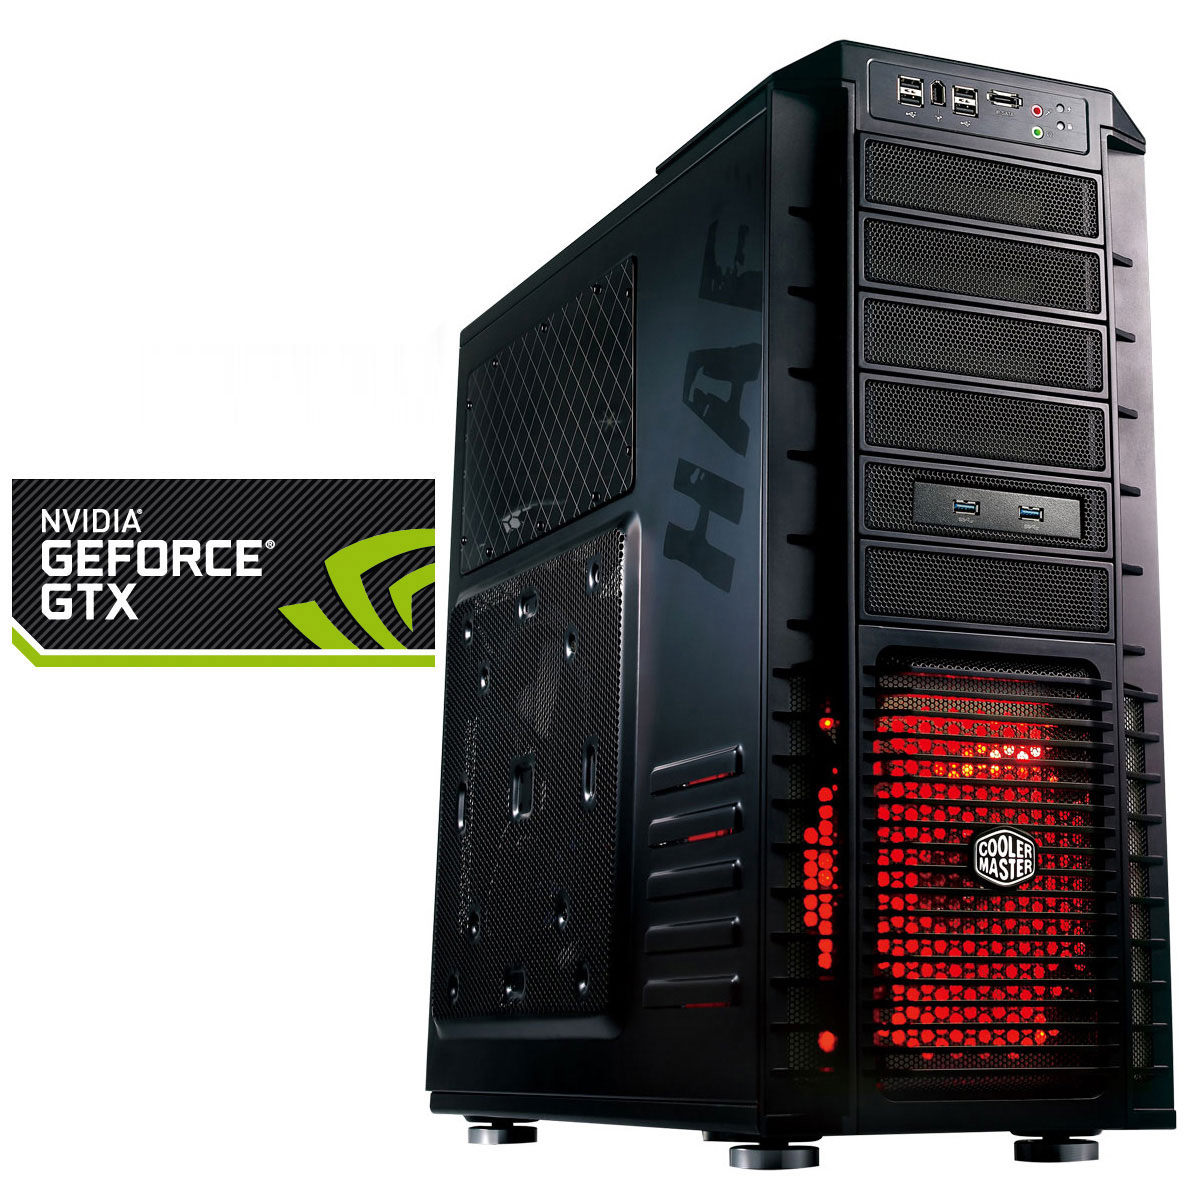 PC de bureau LDLC PC7 Alastor (Haswell) Intel Core i5-4670K 8 Go SSD 120 Go + HDD 2 To NVIDIA GeForce GTX 760 2 Go Graveur DVD Windows 7 Premium 64 bits